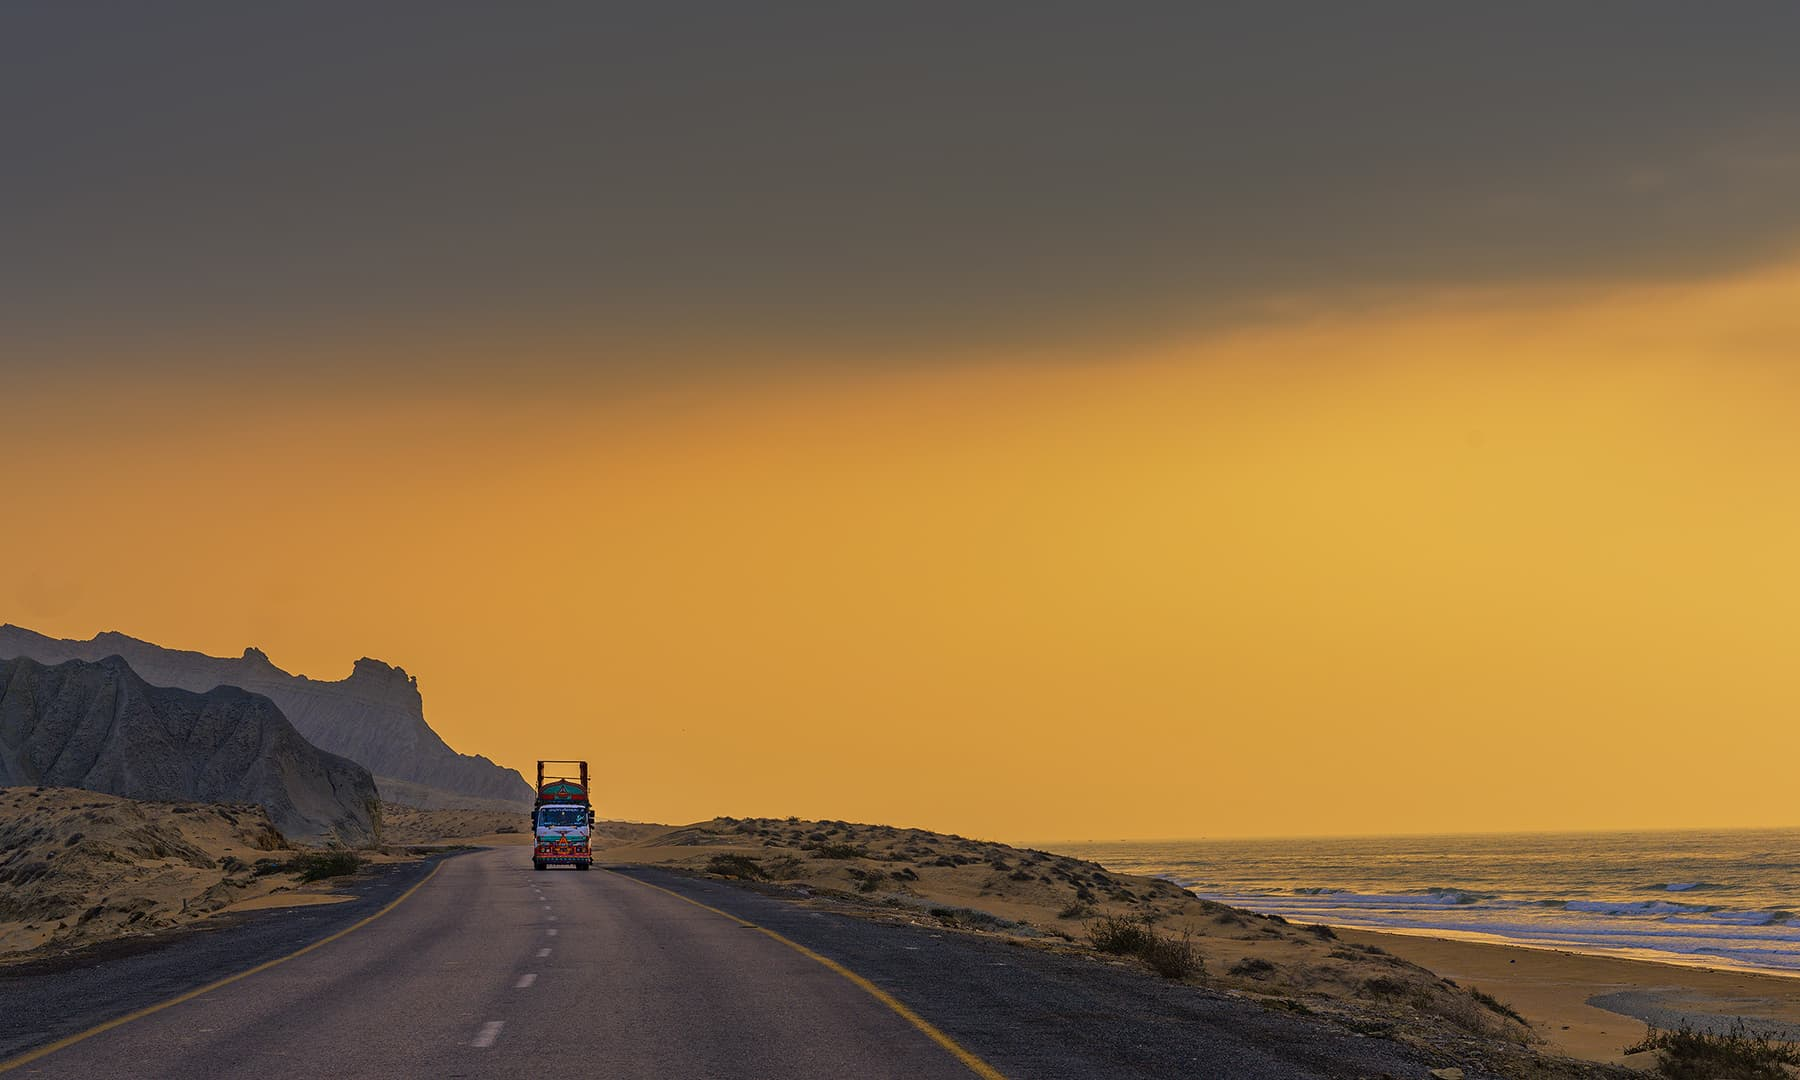 Coastal Highway, Hangul-Syed Mahdi Bukhari